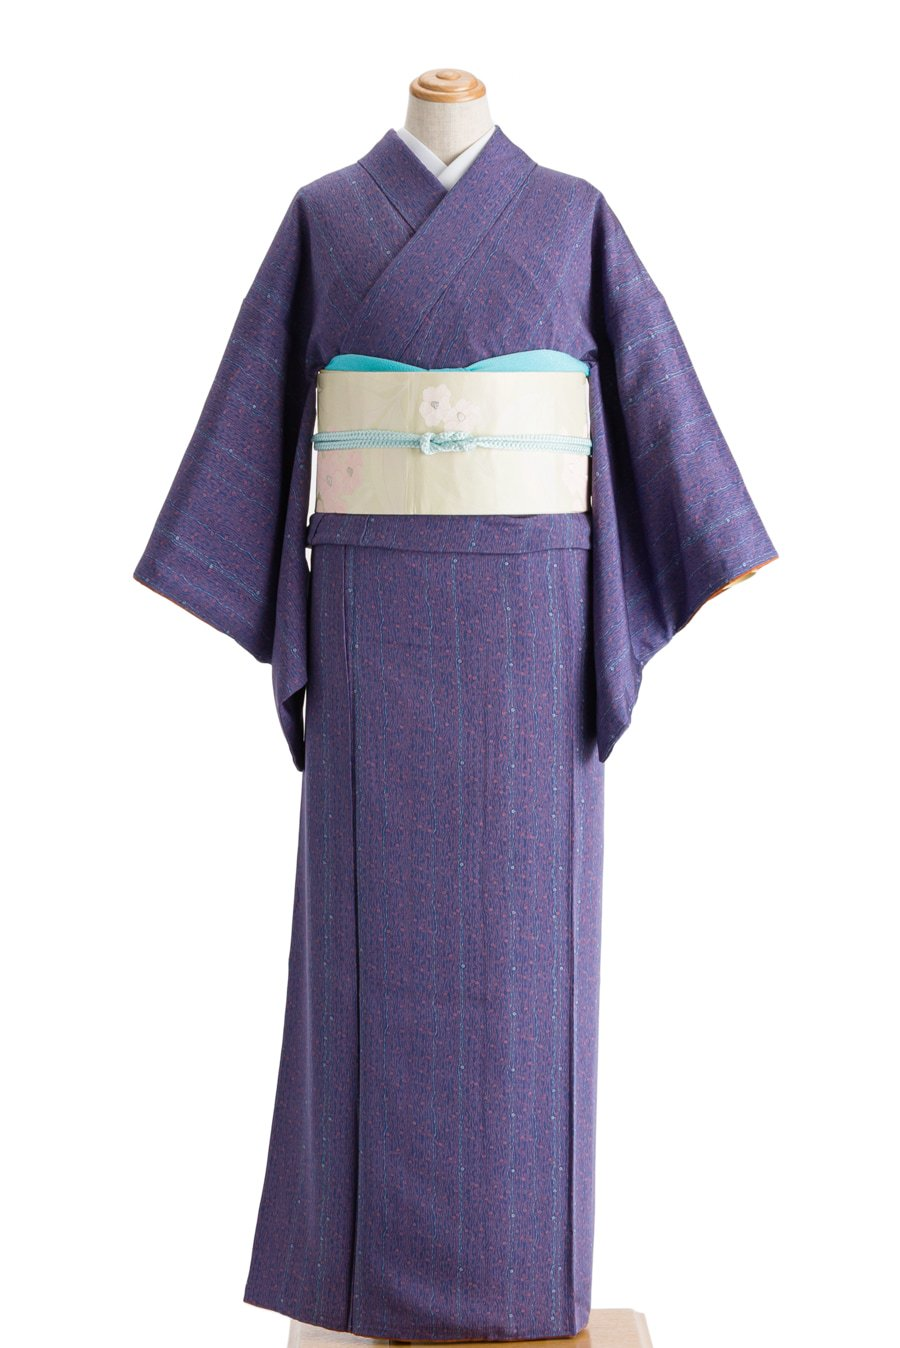 「青紫地 桜流水」の商品画像